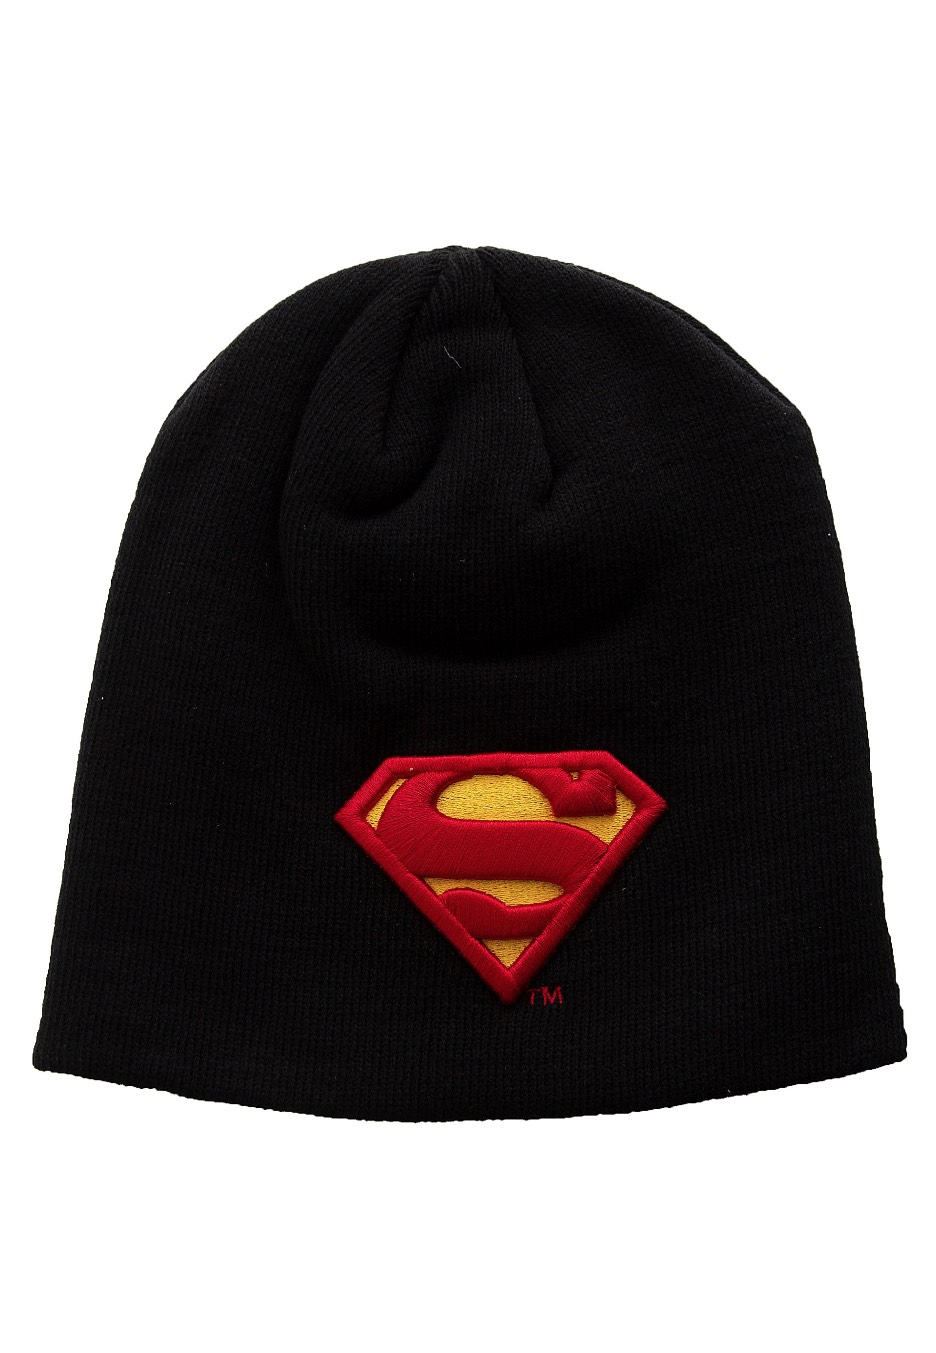 6836338b41b Superman - Classic 3D Logo Black - Beanie - Impericon.com UK